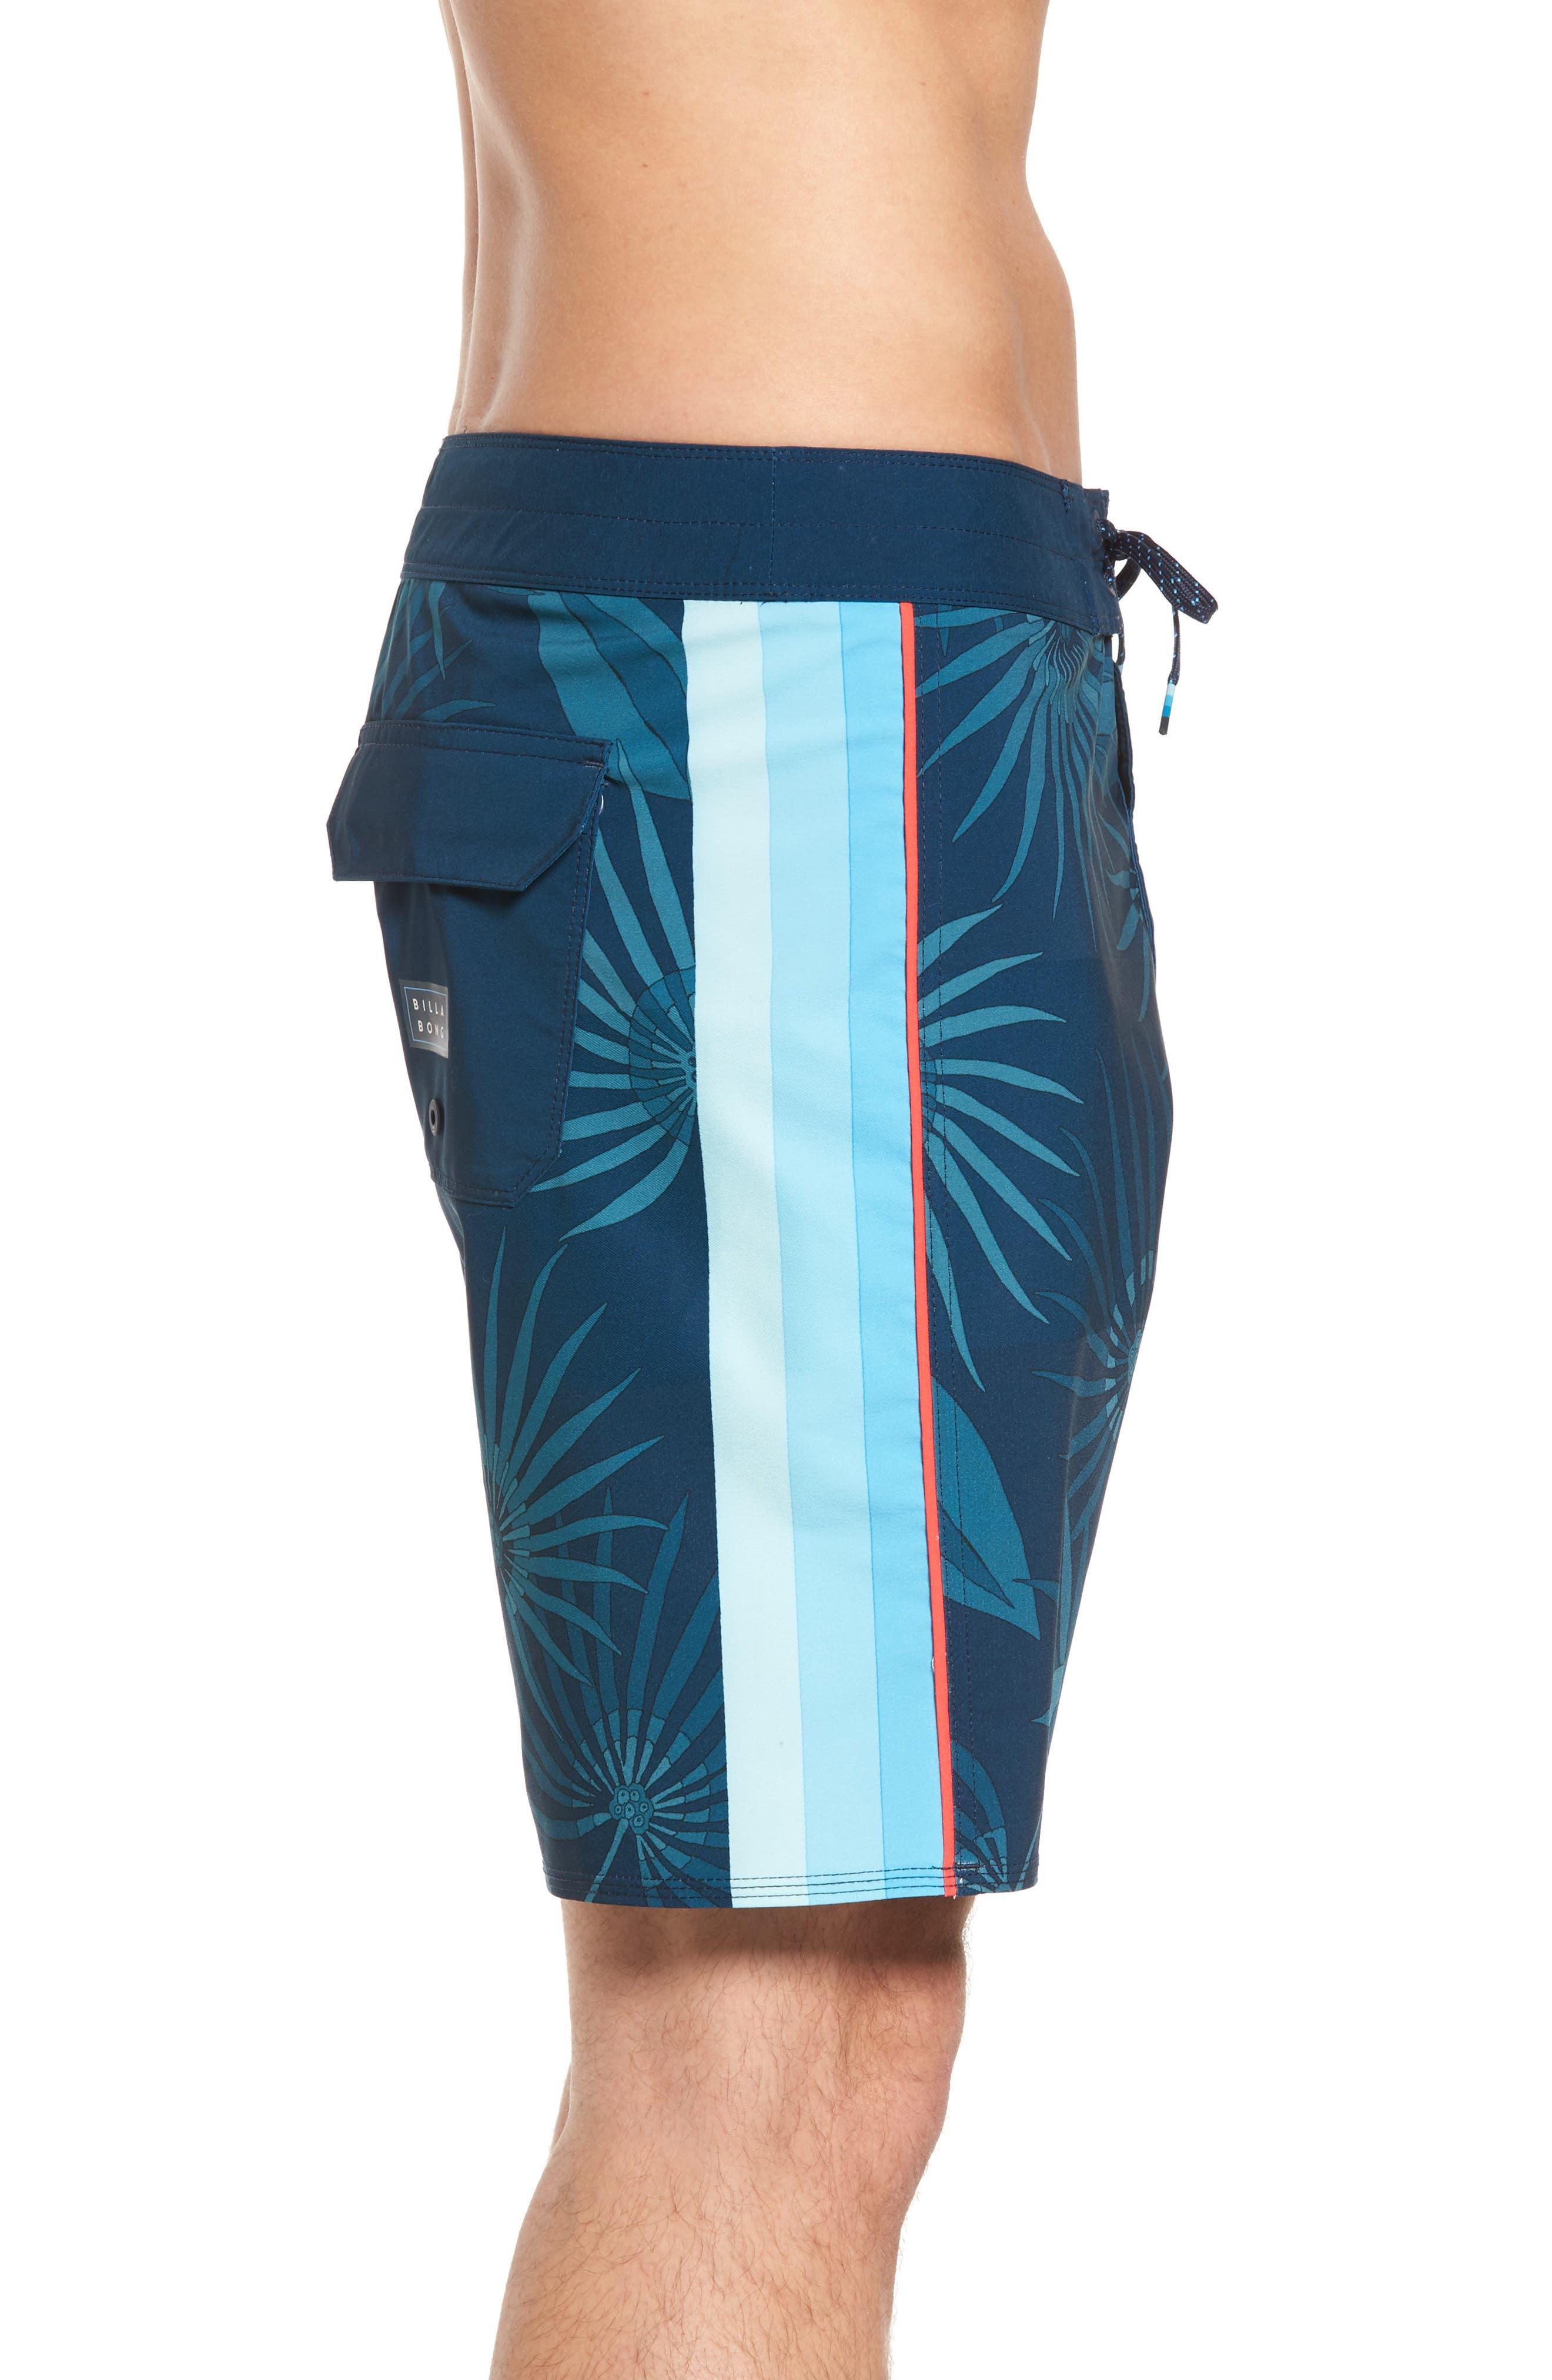 D Bah Airlite Board Shorts,                             Alternate thumbnail 16, color,